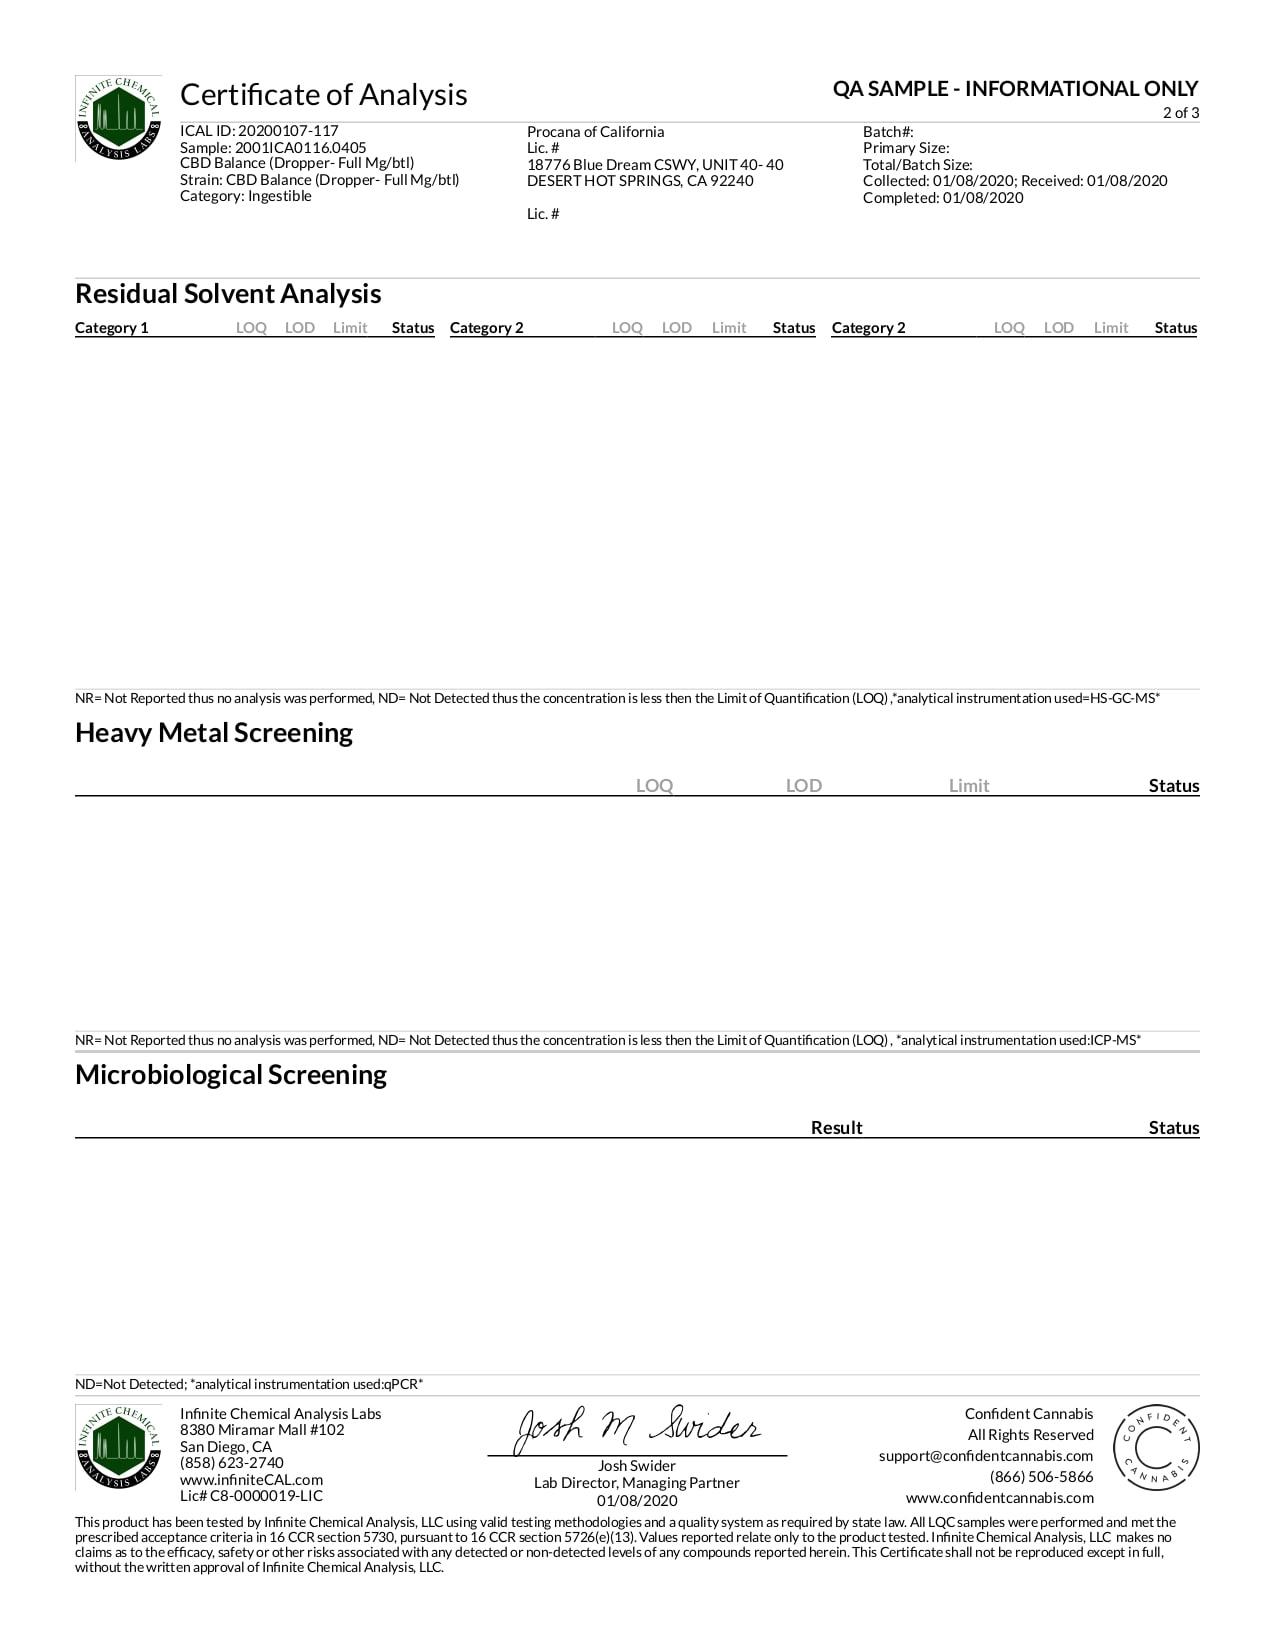 Procana CBD Tincture Balance Lab Report 240mg